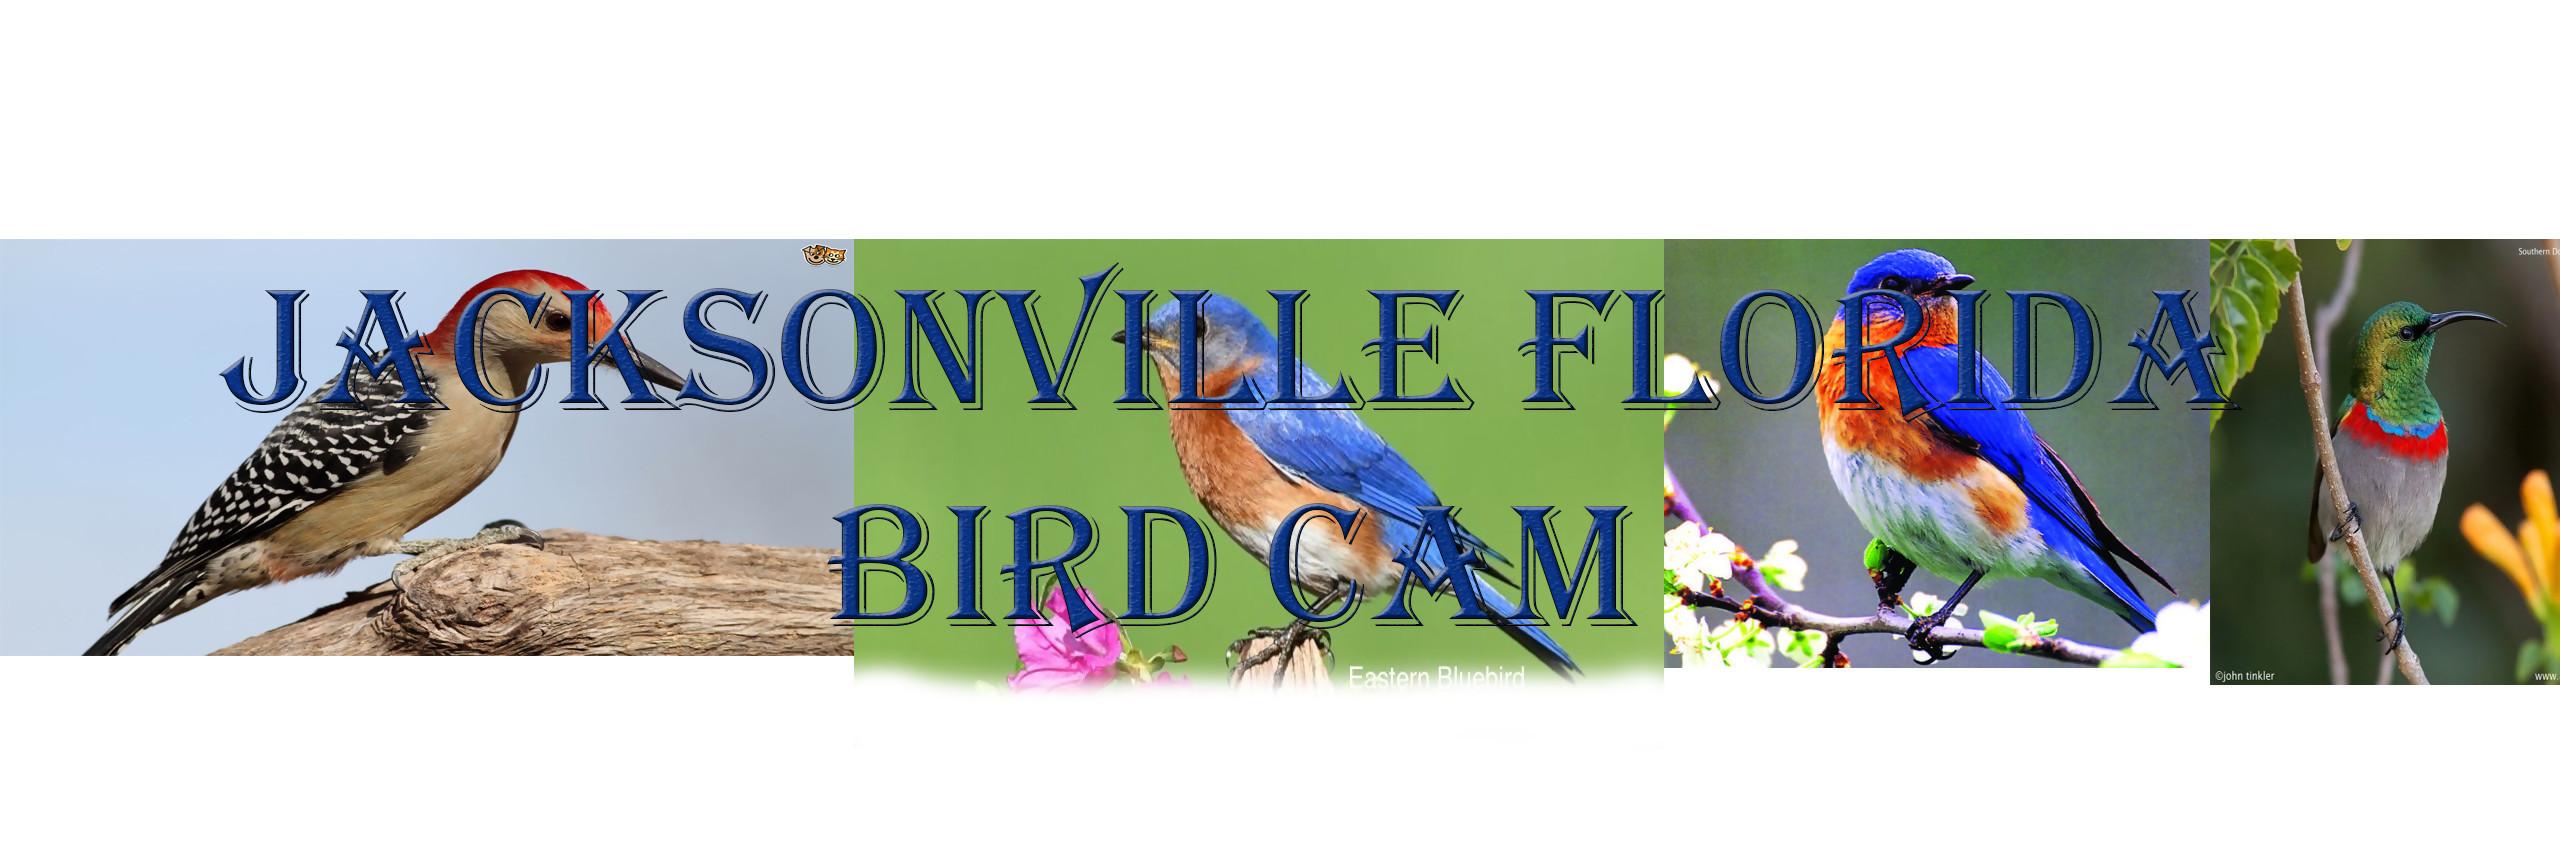 Jacksonville Florida Wild Bird Cam